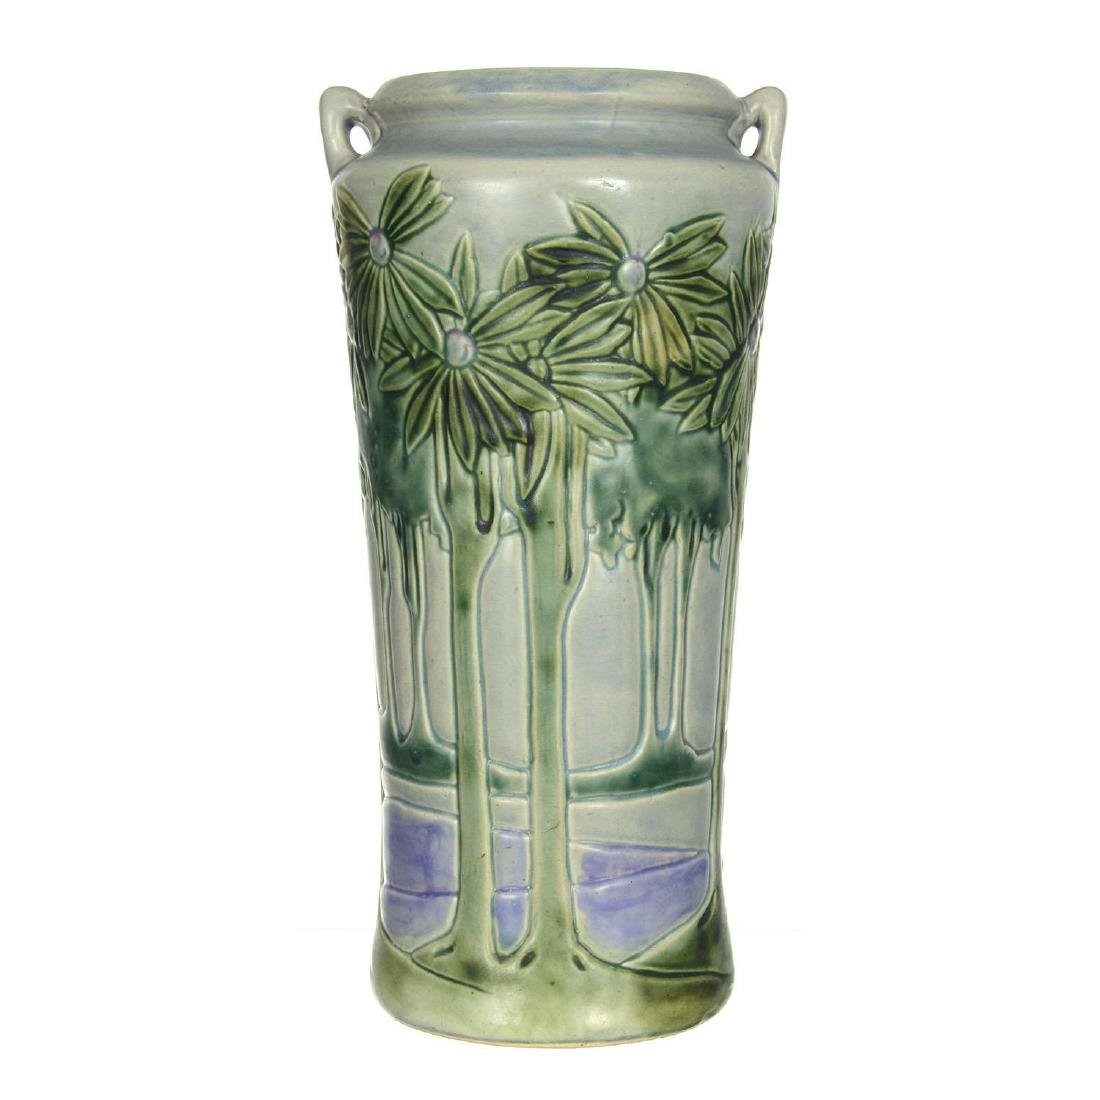 "14.75"" X 7.5"" Unmarked Roseville Art Pottery Vase"